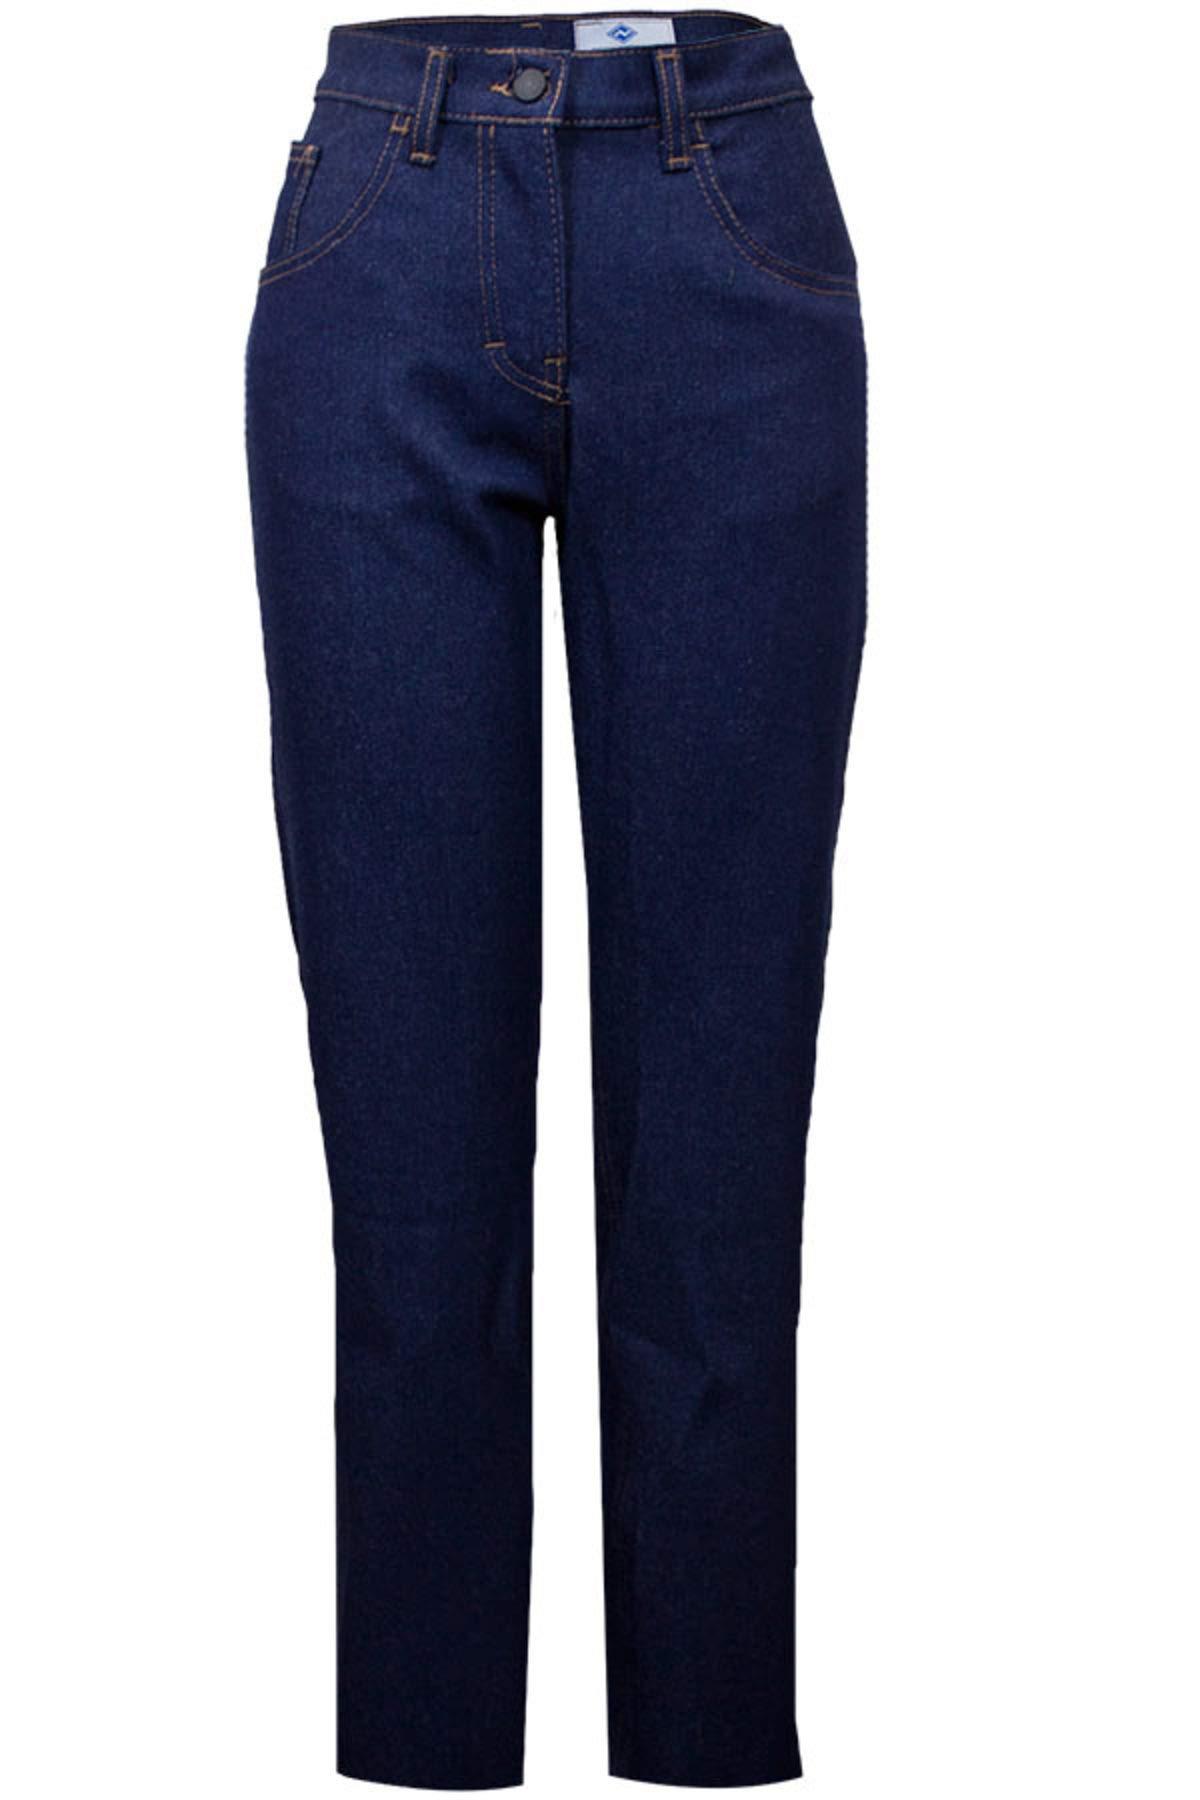 National Safety Apparel PNTDYJW2X32 Women's Flame Resistant Jean, 2'' x 32'', Denim Blue